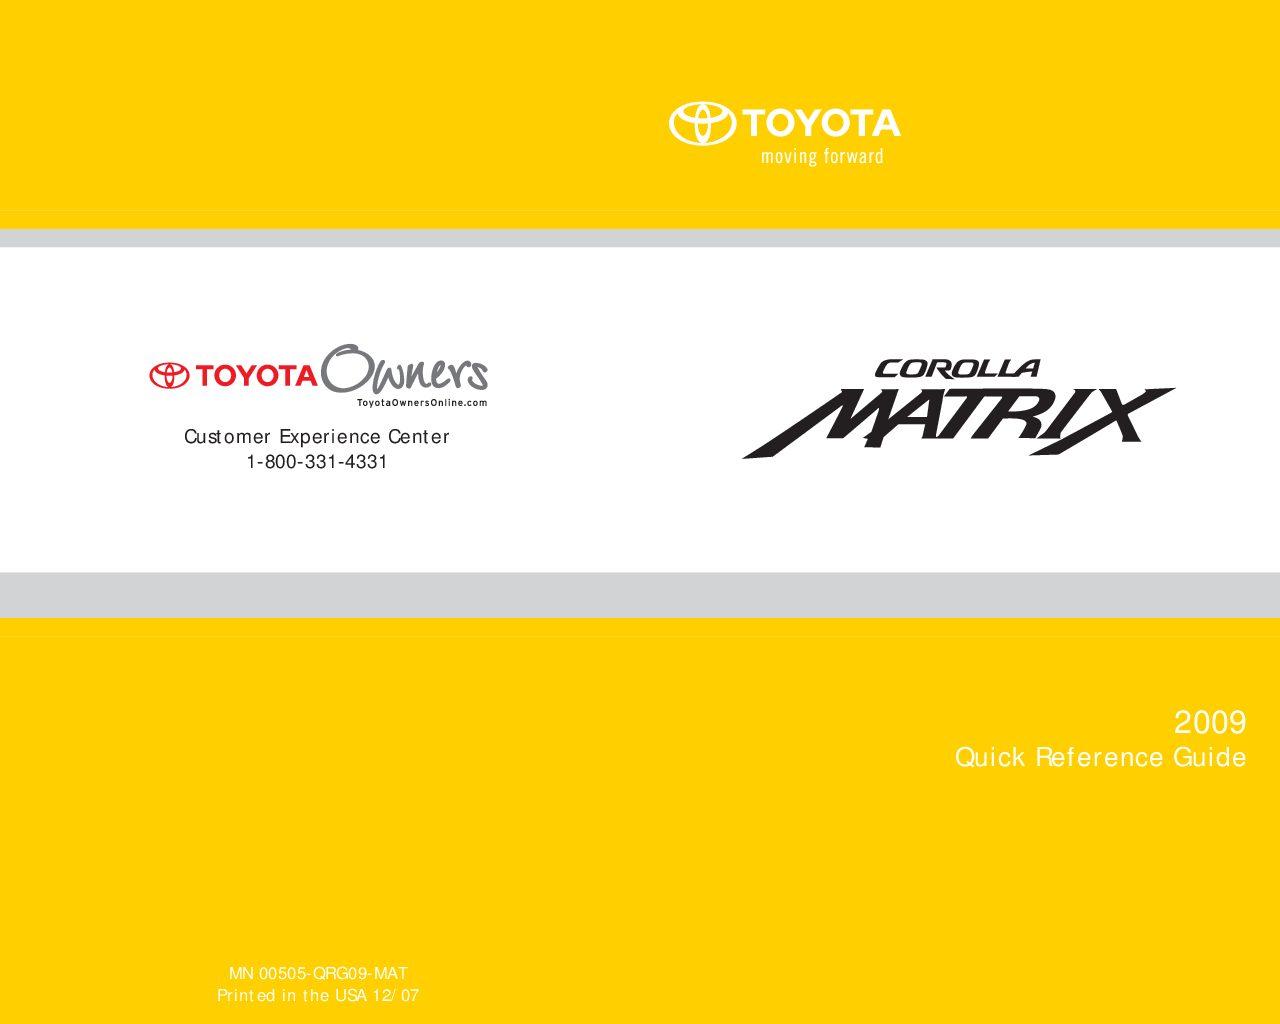 2009 Toyota Matrix Owner's Manual Image